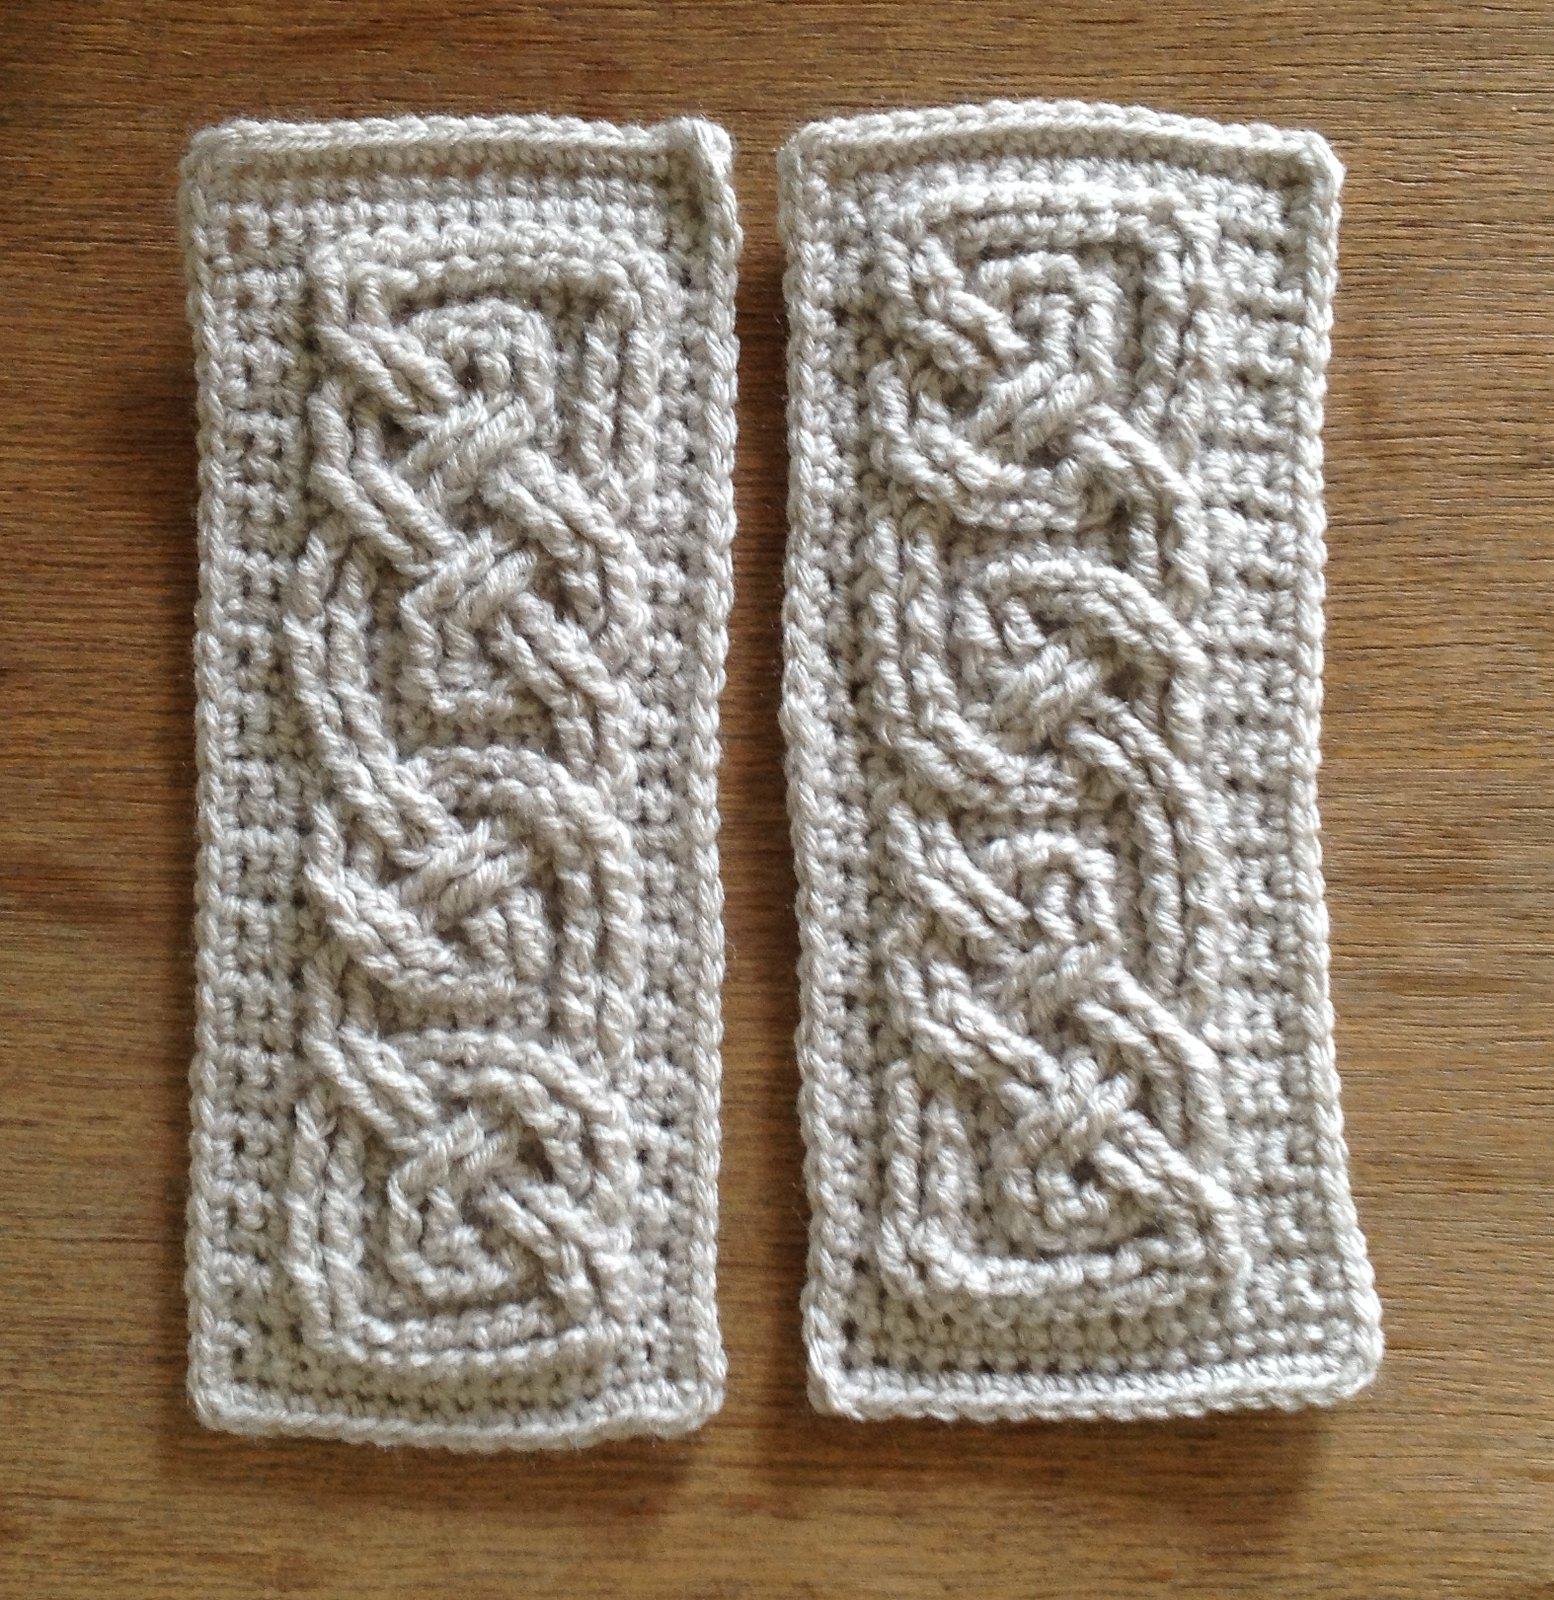 Suvi\'s Crochet: Book of Kells - Small Celtic Cables